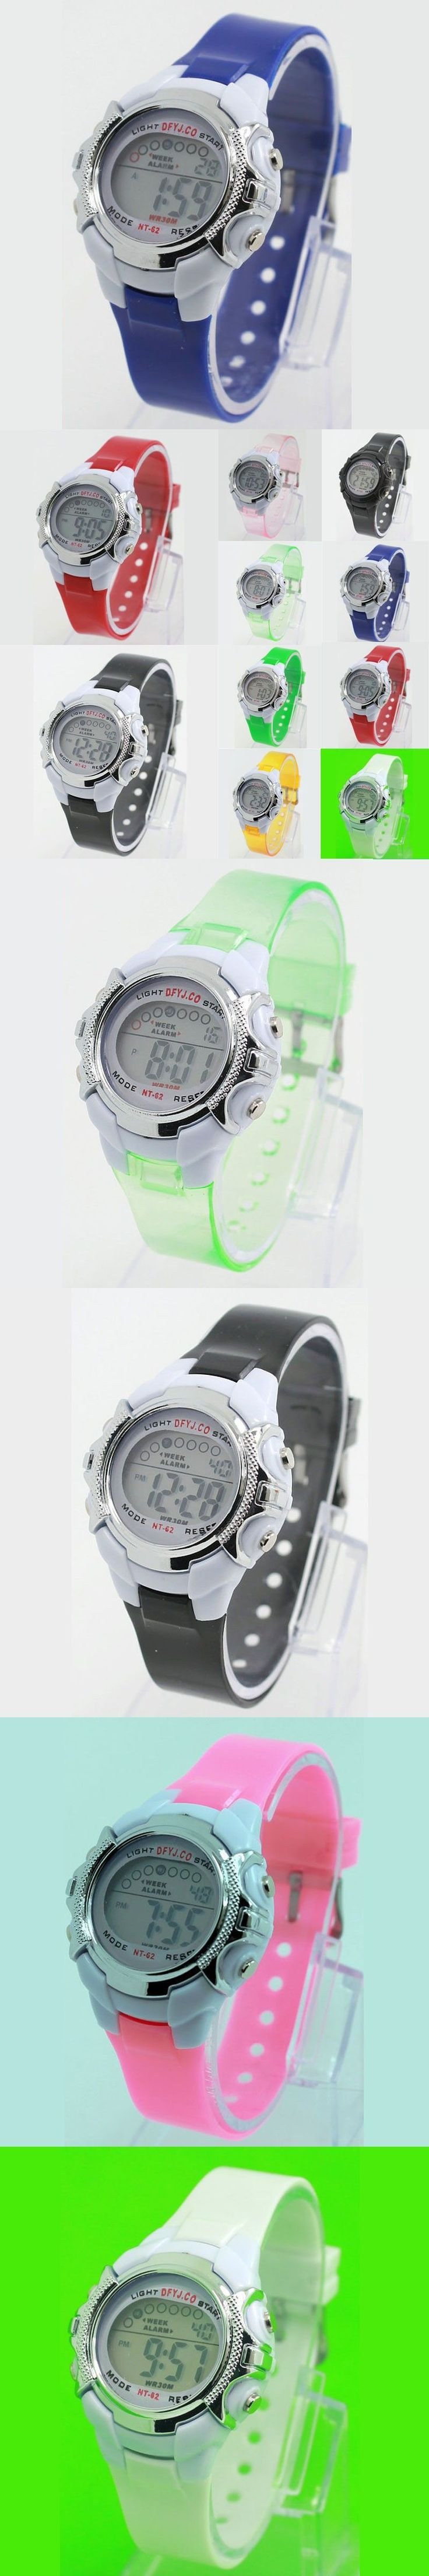 Tooptoot Relojes mujer 2016 Watch Girl Boy Alarm Date Digital Watches Multifunction Sport LED Light Kids Student Wristwatch